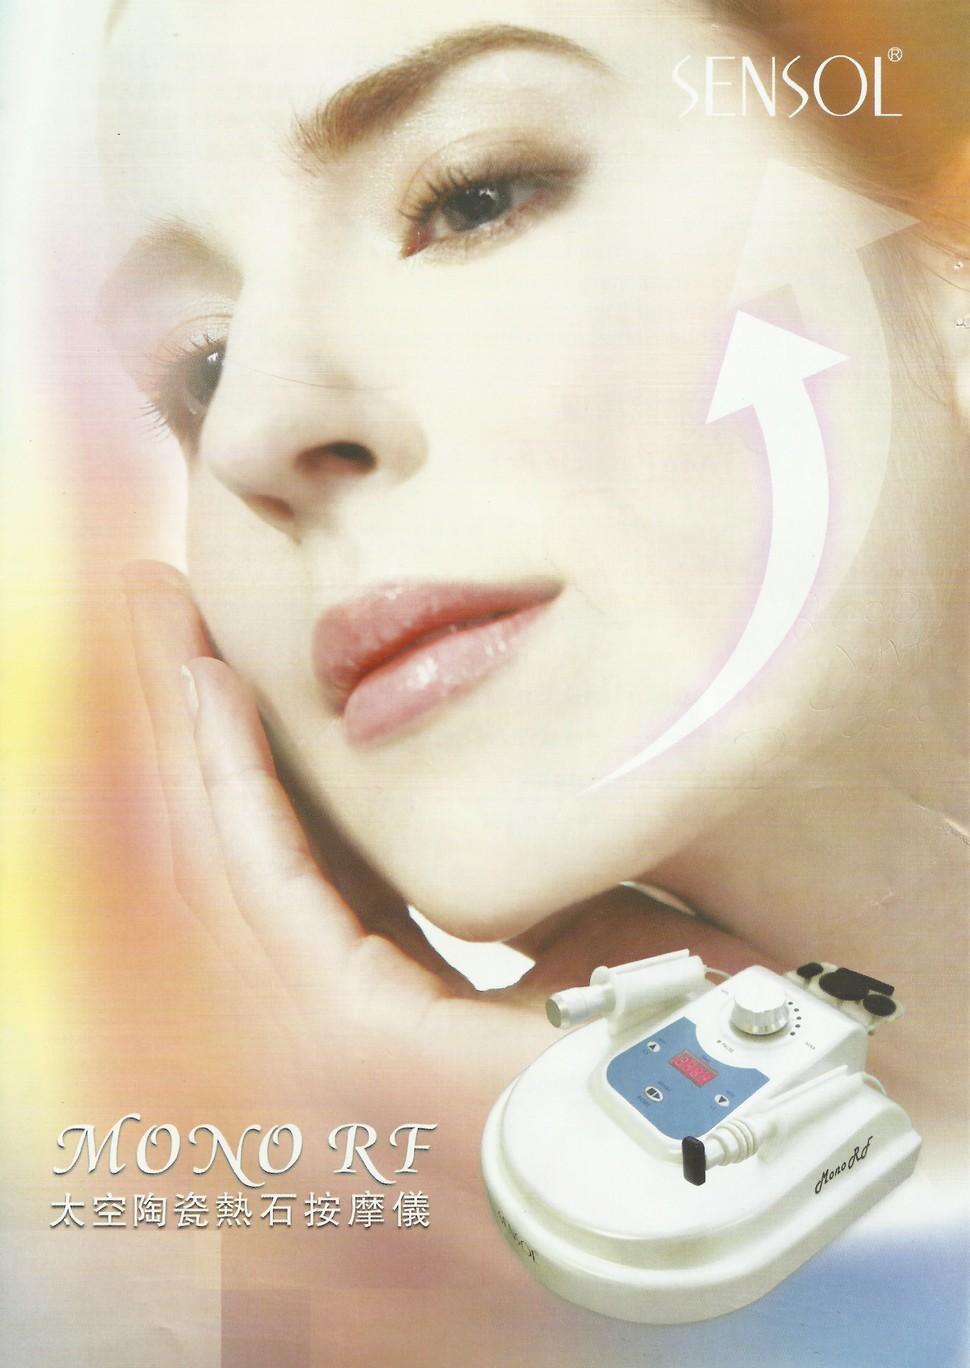 http://beauteousbeauty.com/files/SENSOL%E6%8C%89%E6%91%A9%E5%84%801.jpg